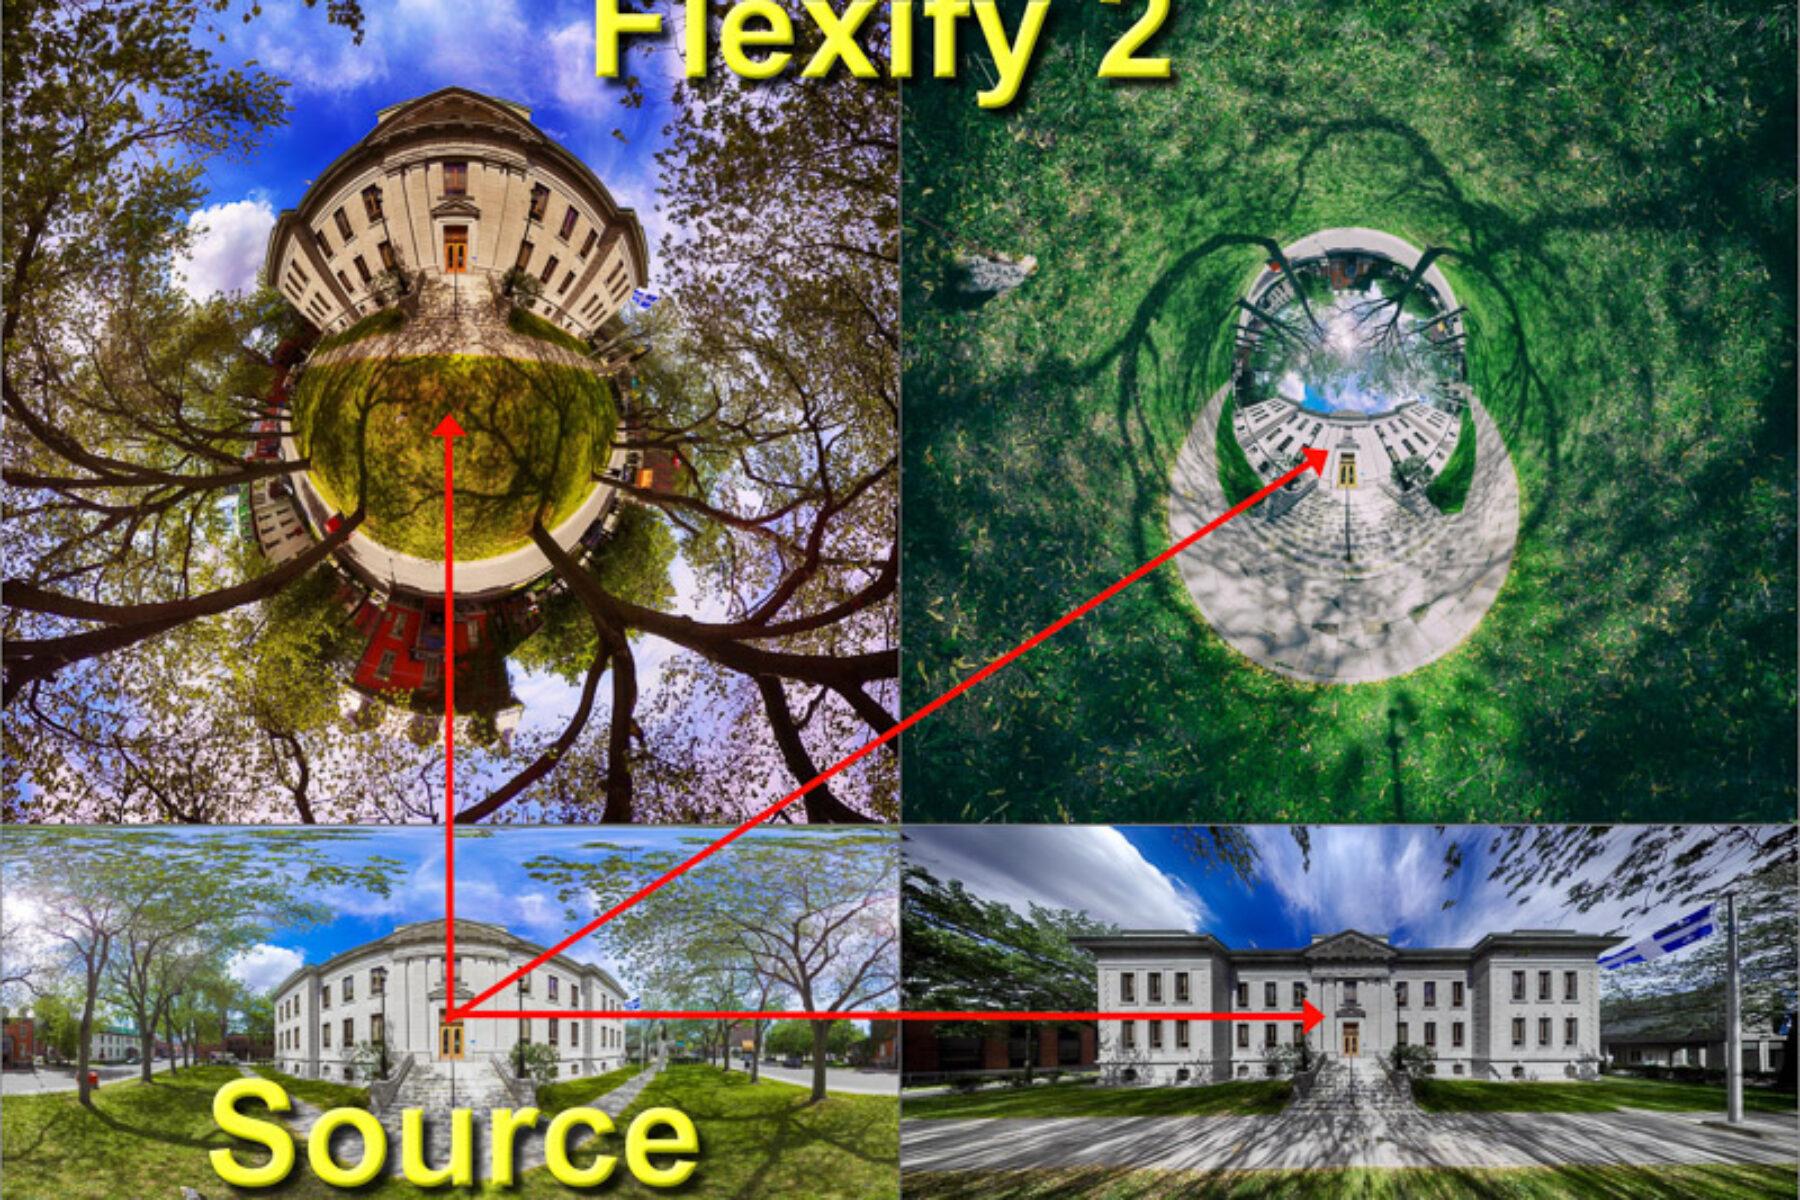 Flexify 2 de Flaming Pear Software